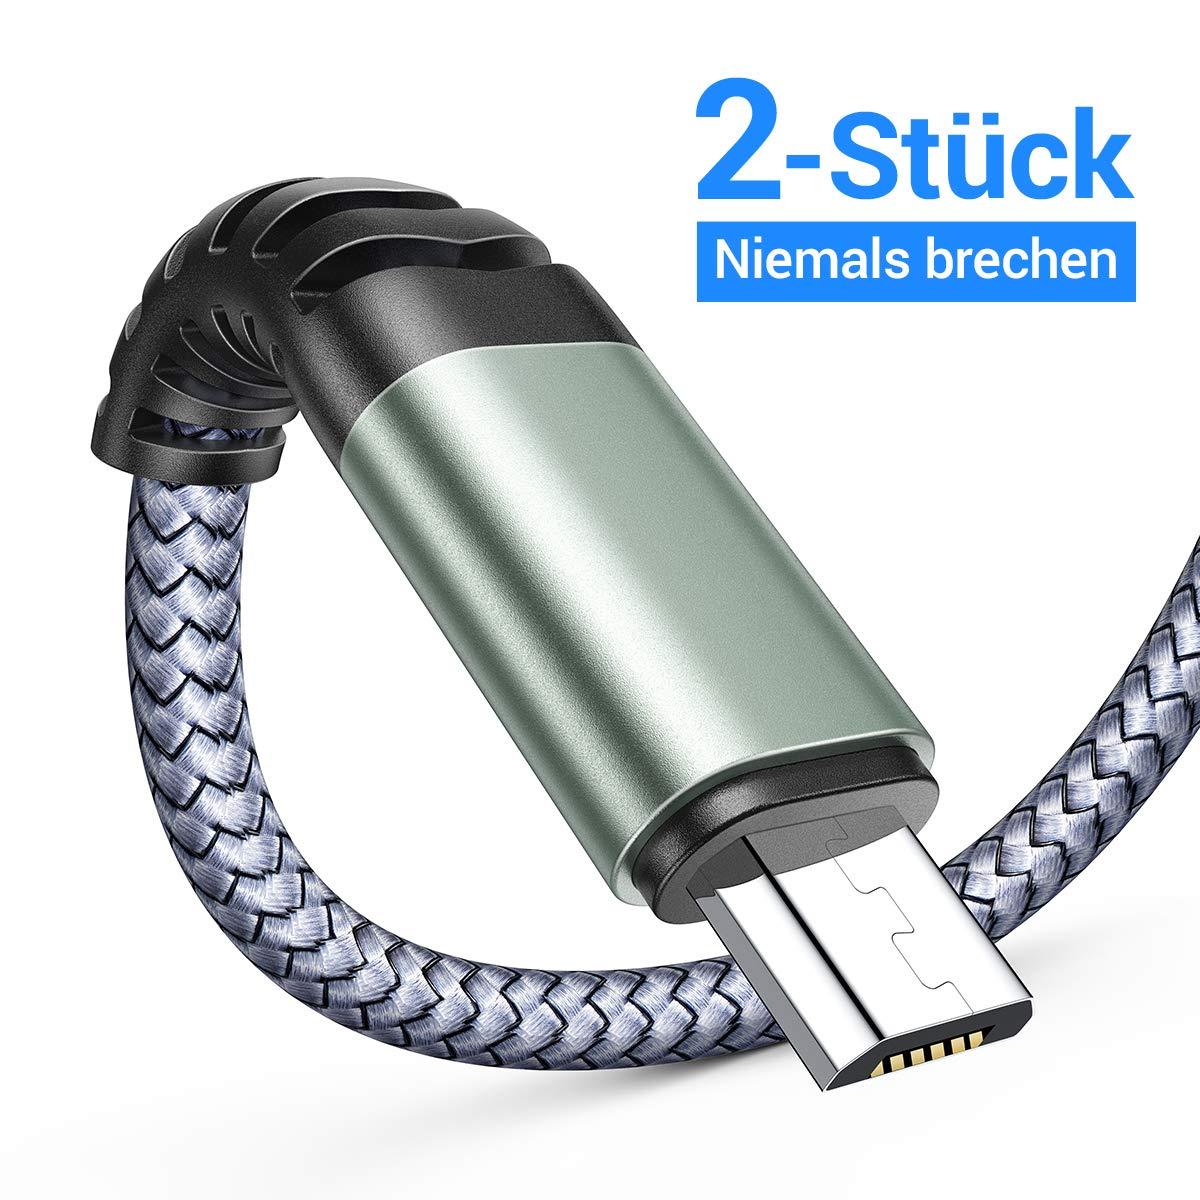 AINOPE 2 Stück 2M Micro USB Handy Samsung Ladekabel Nylon Android Micro Kabel